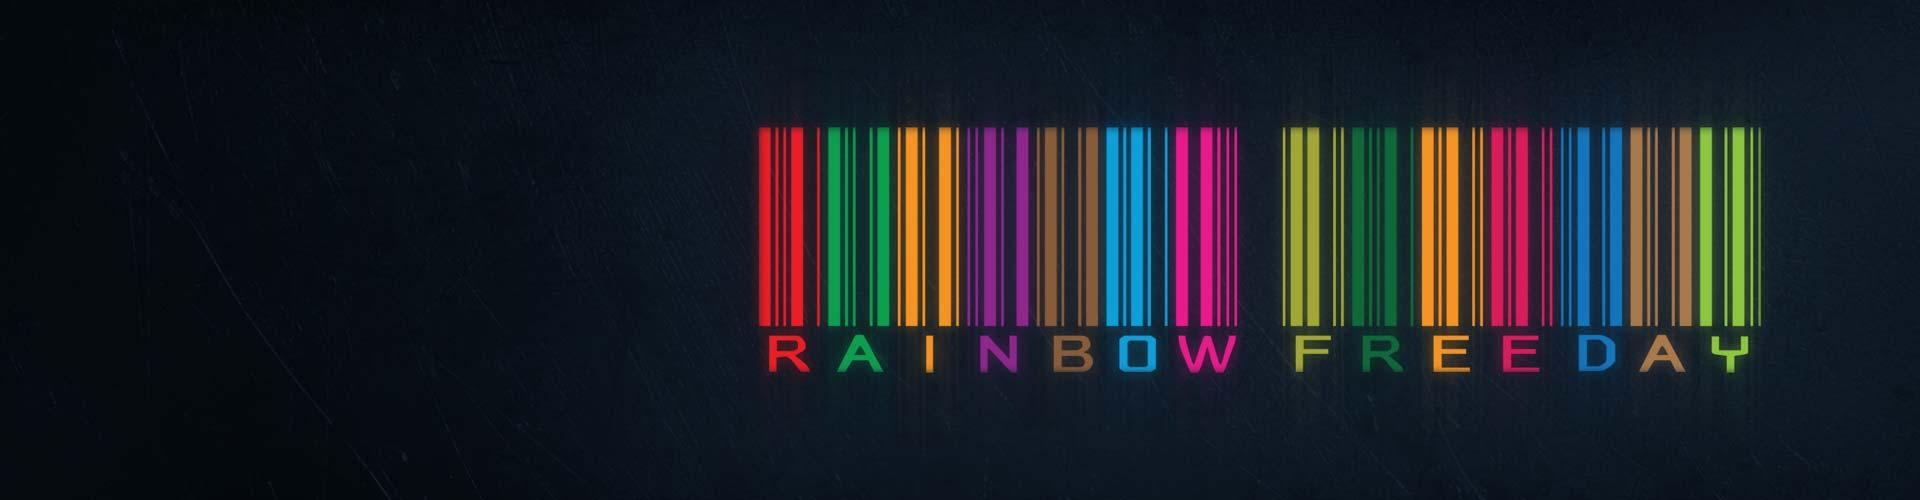 RAINBOW FREE DAY